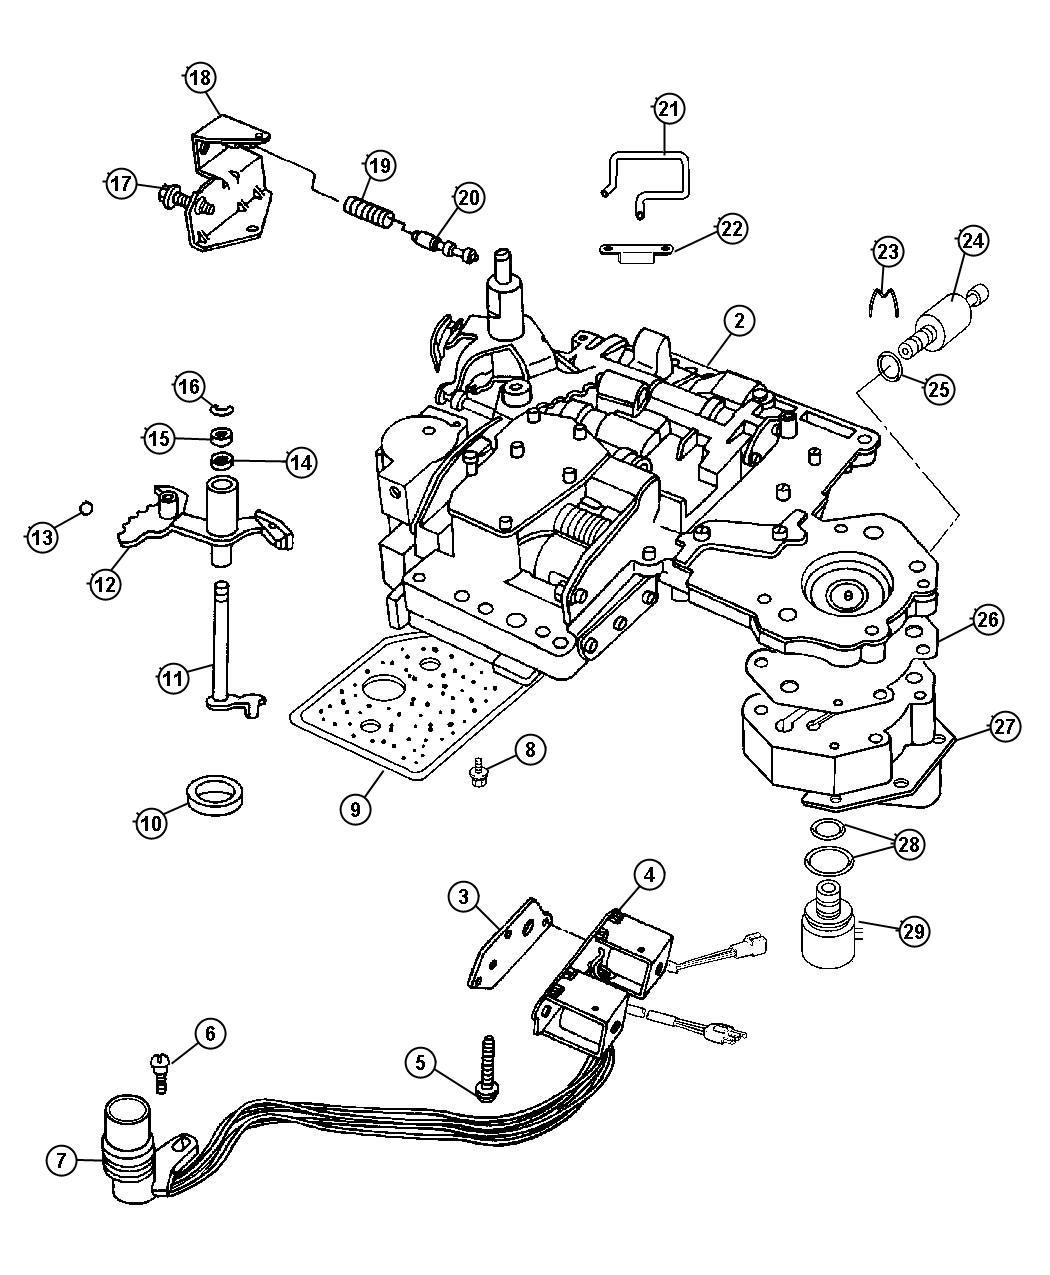 dodge ram 1500 wiring diagram on 2005 dodge ram 2500 engine diagram